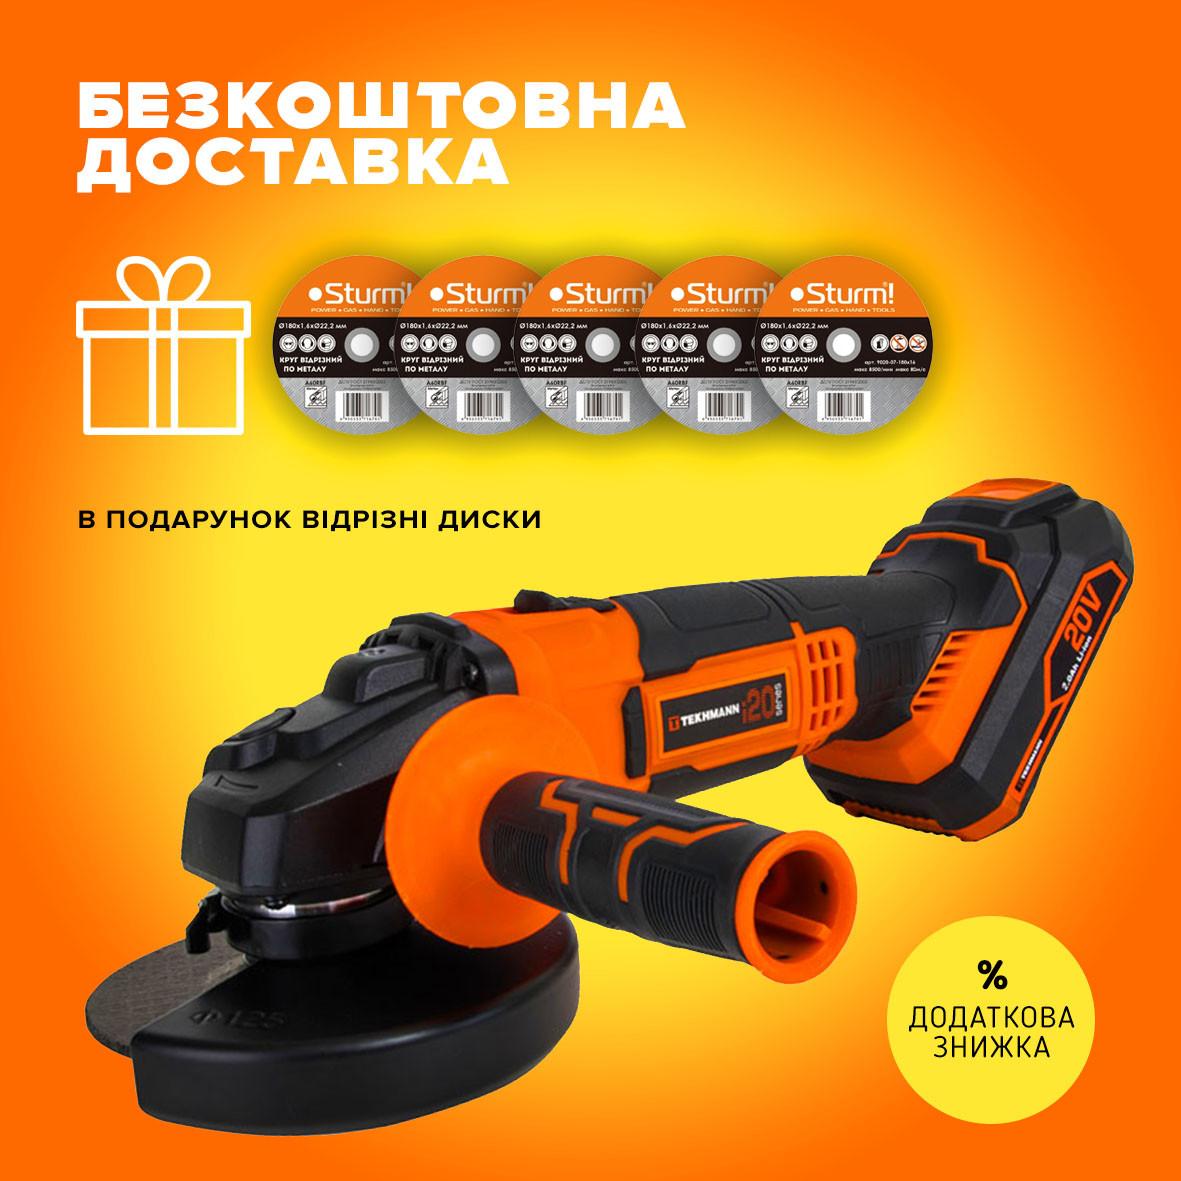 ШЛІФМАШИНА КУТОВА АКУМУЛЯТОРНА TEKHMANN TAG-125/I20 KIT / акумуляторна болгарка / безкоштовна доставка